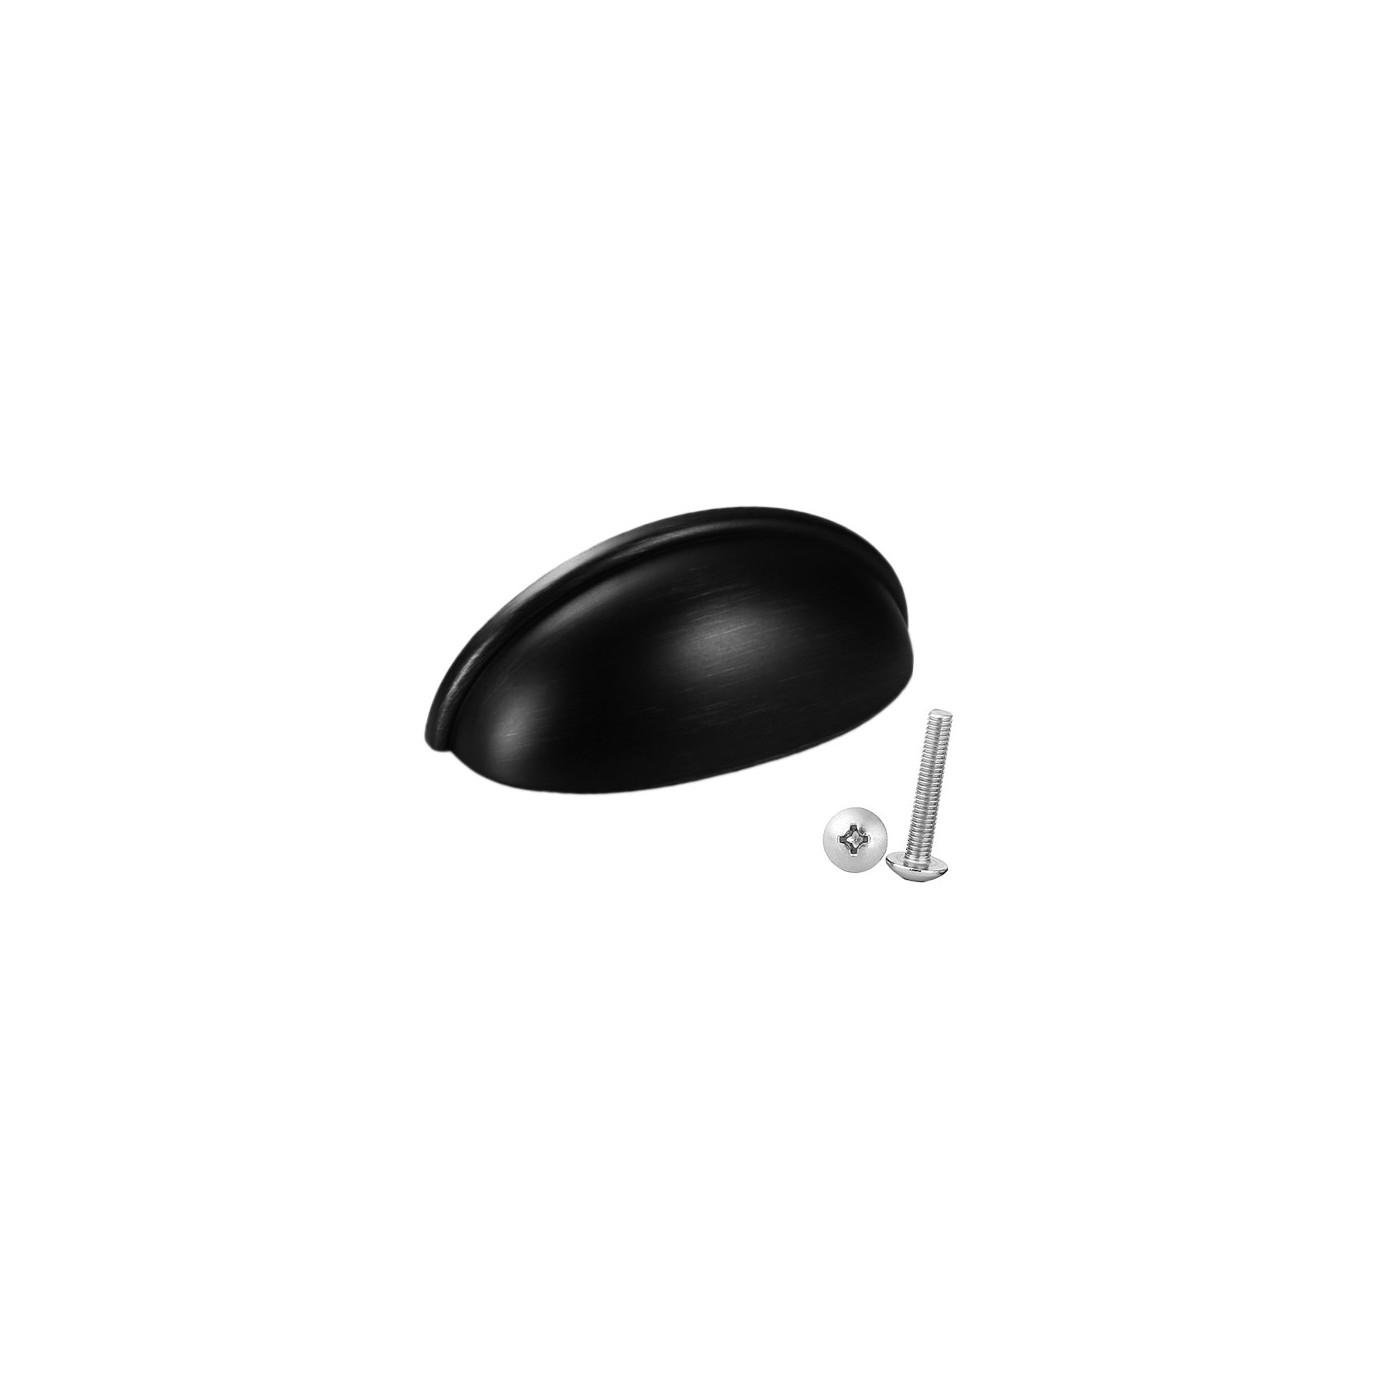 Set di 10 maniglie a forma di conchiglia, per mobili: nero